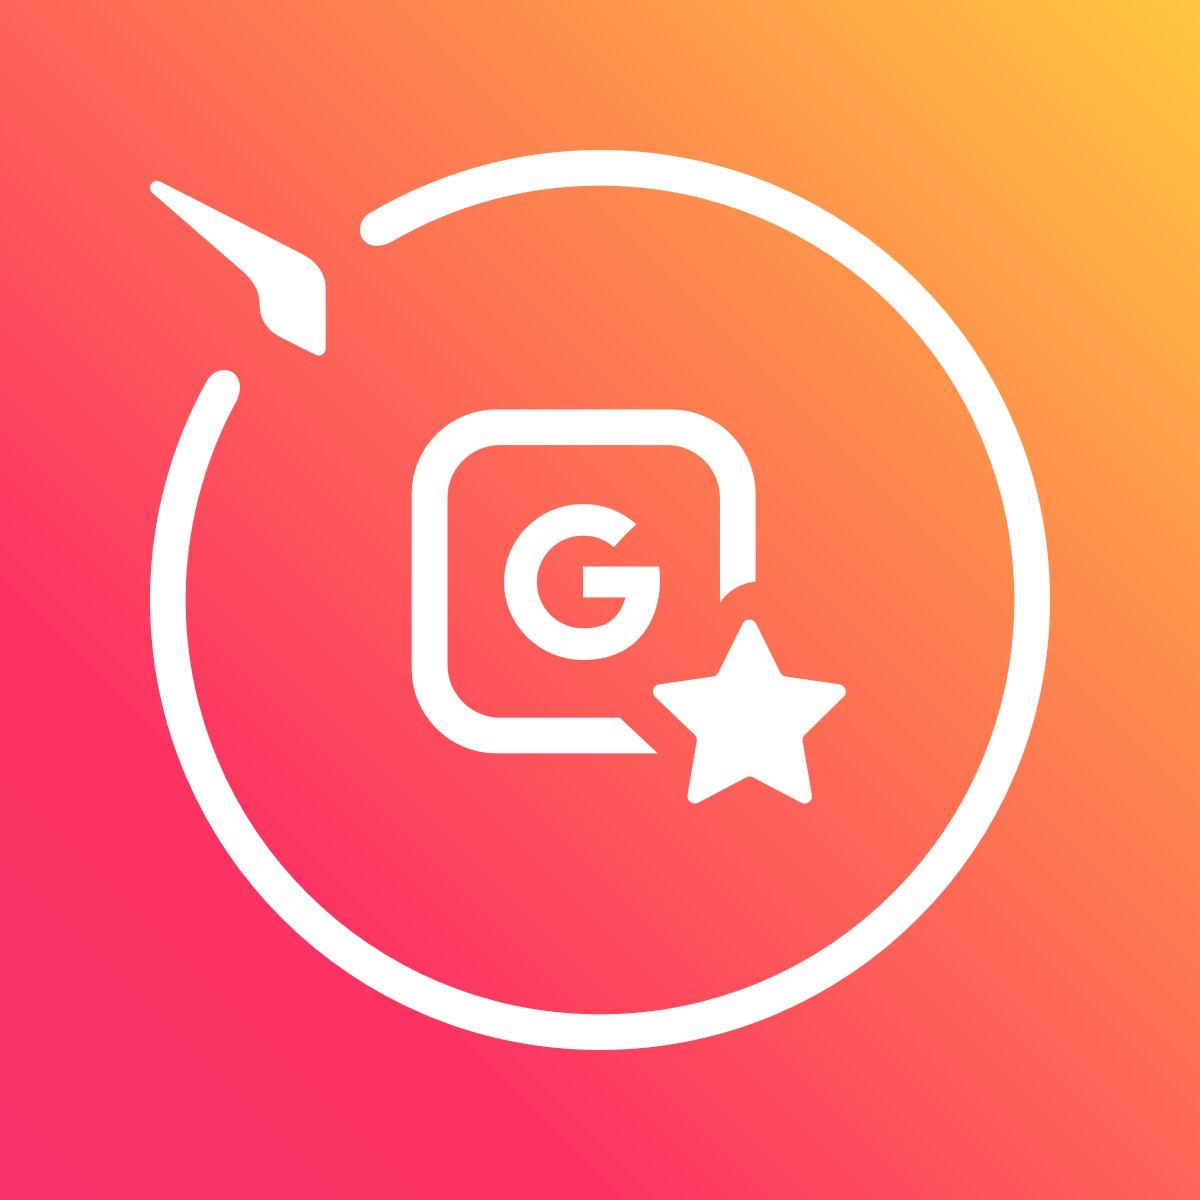 Shopify Google Reviews app by Elfsight